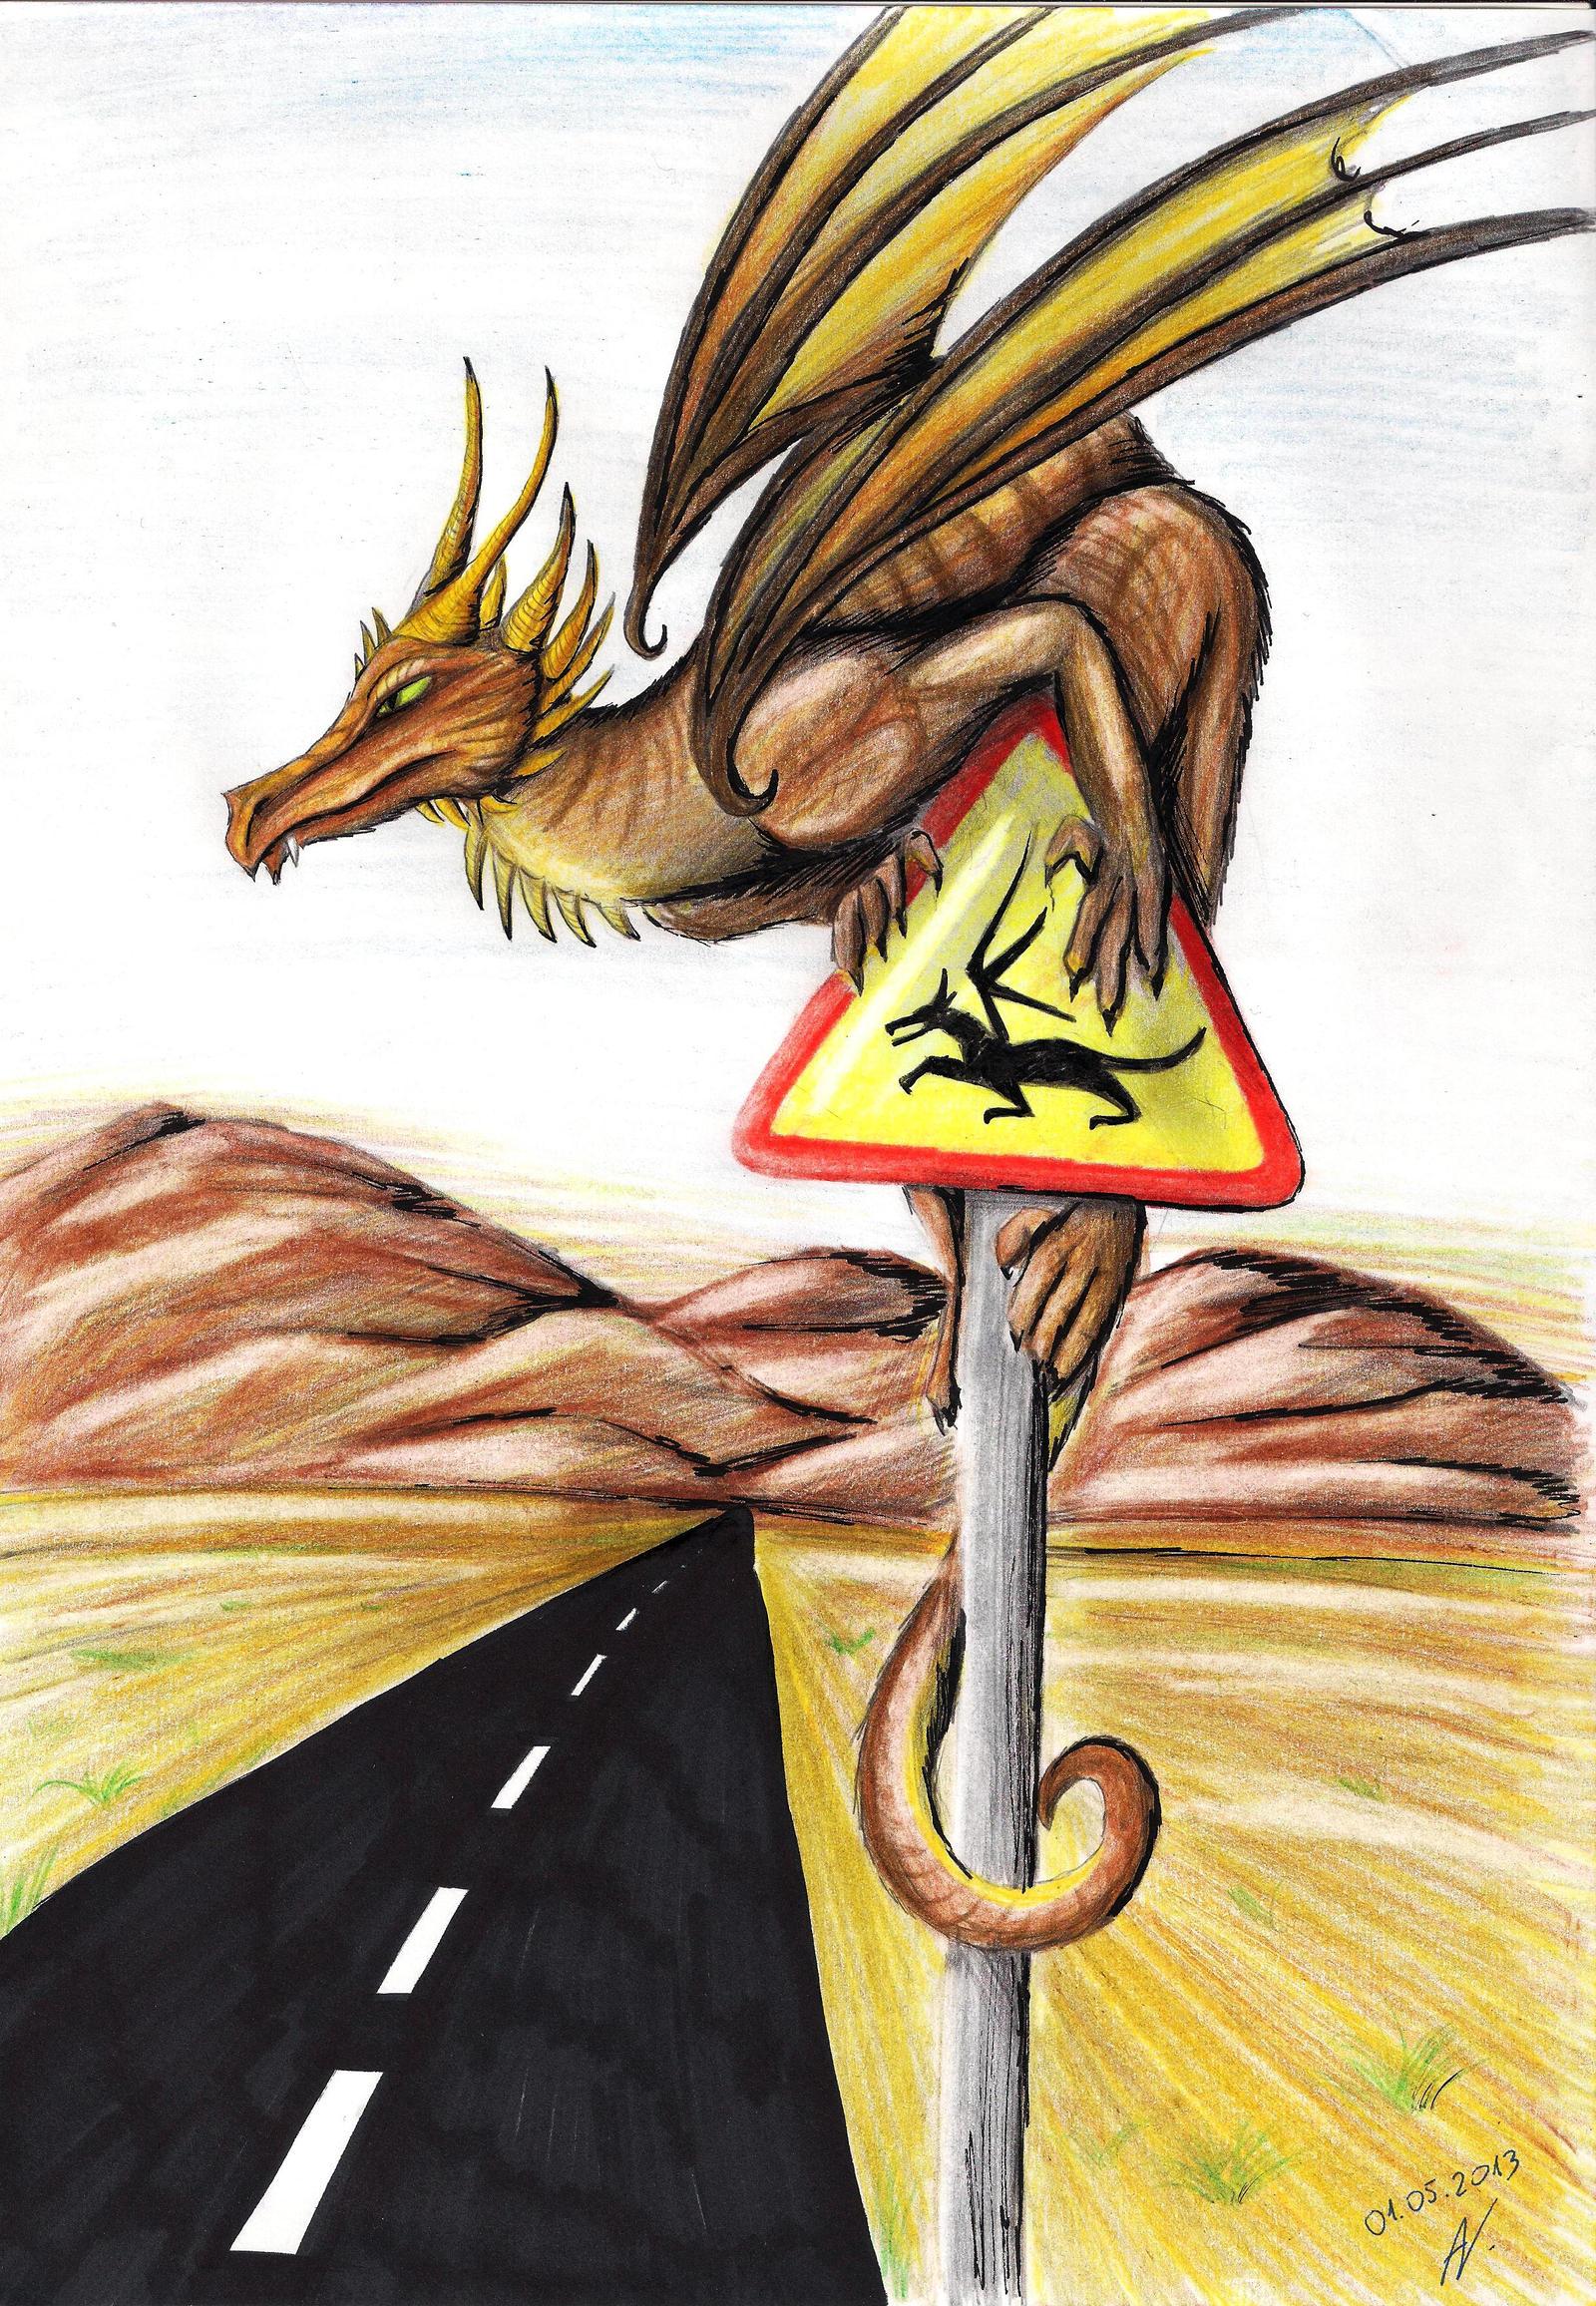 Desert dragon. by Wojak1991